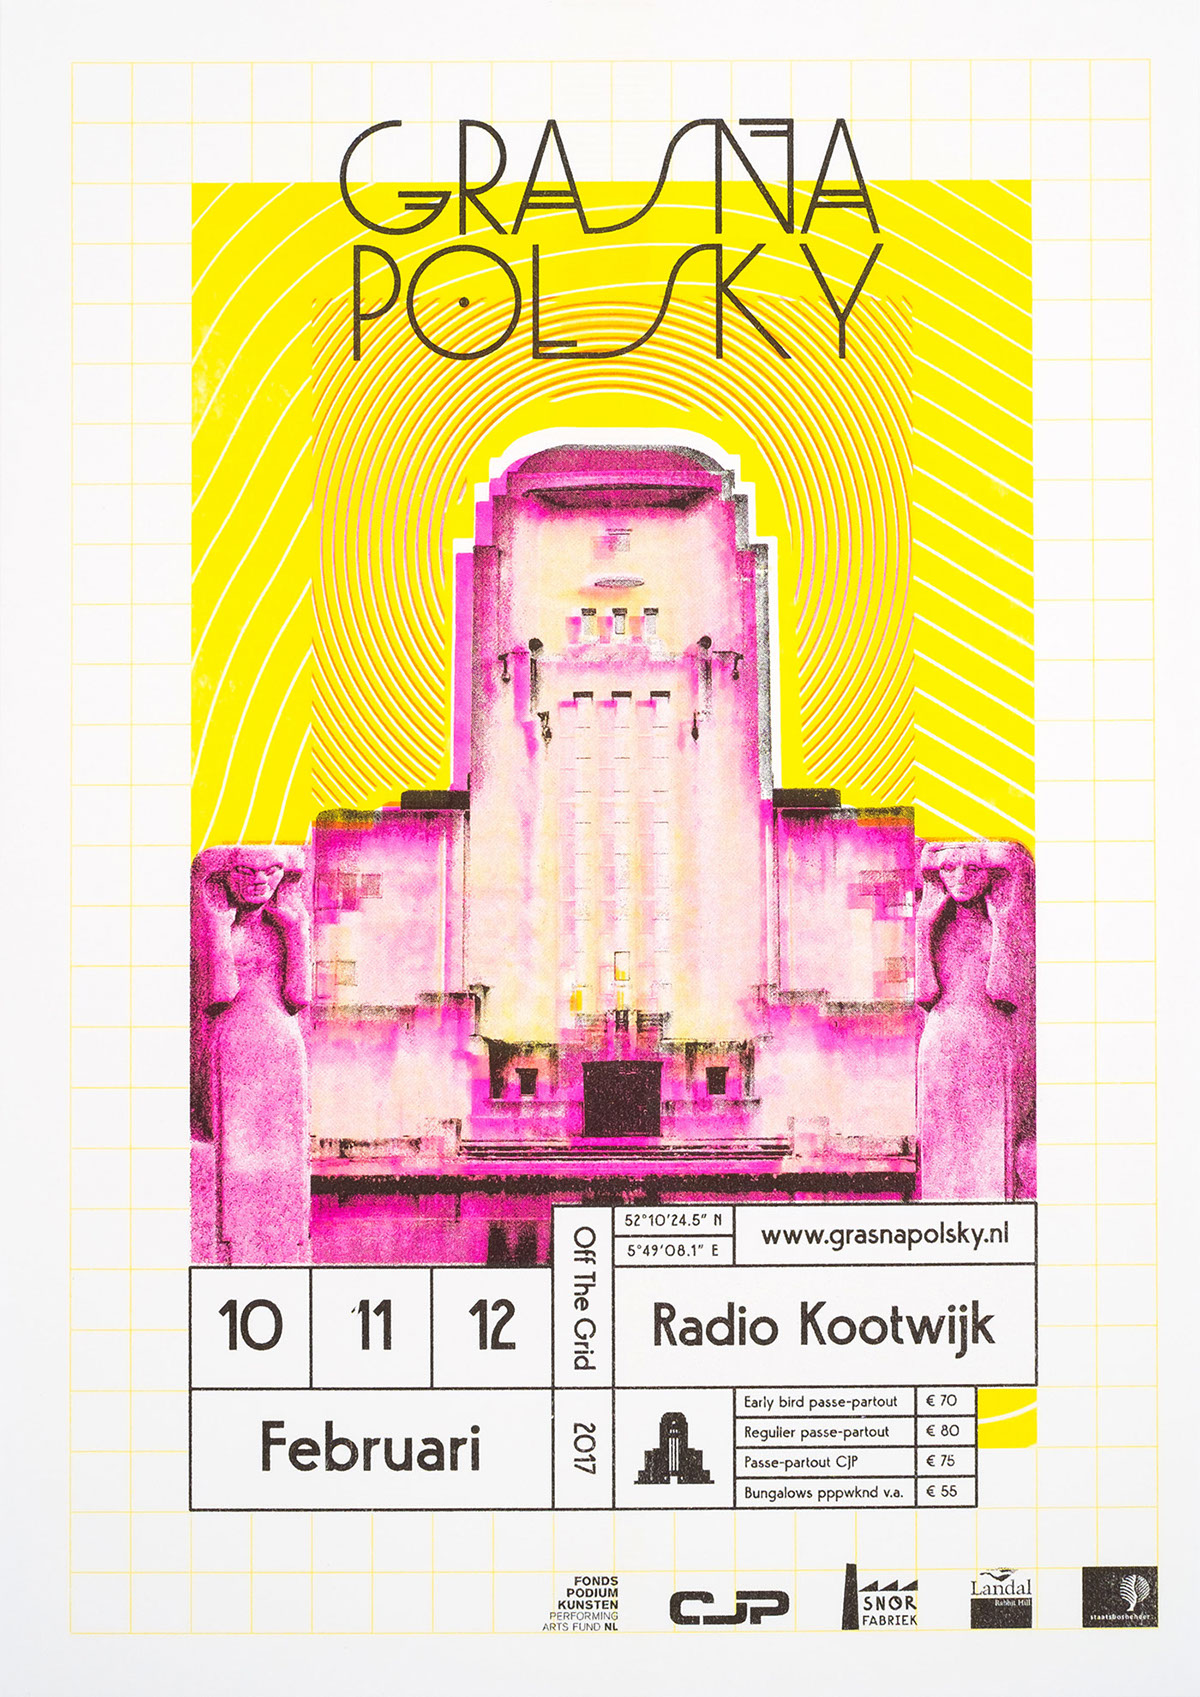 Grasnapolsky Festival 2017 by Nick Liefhebber